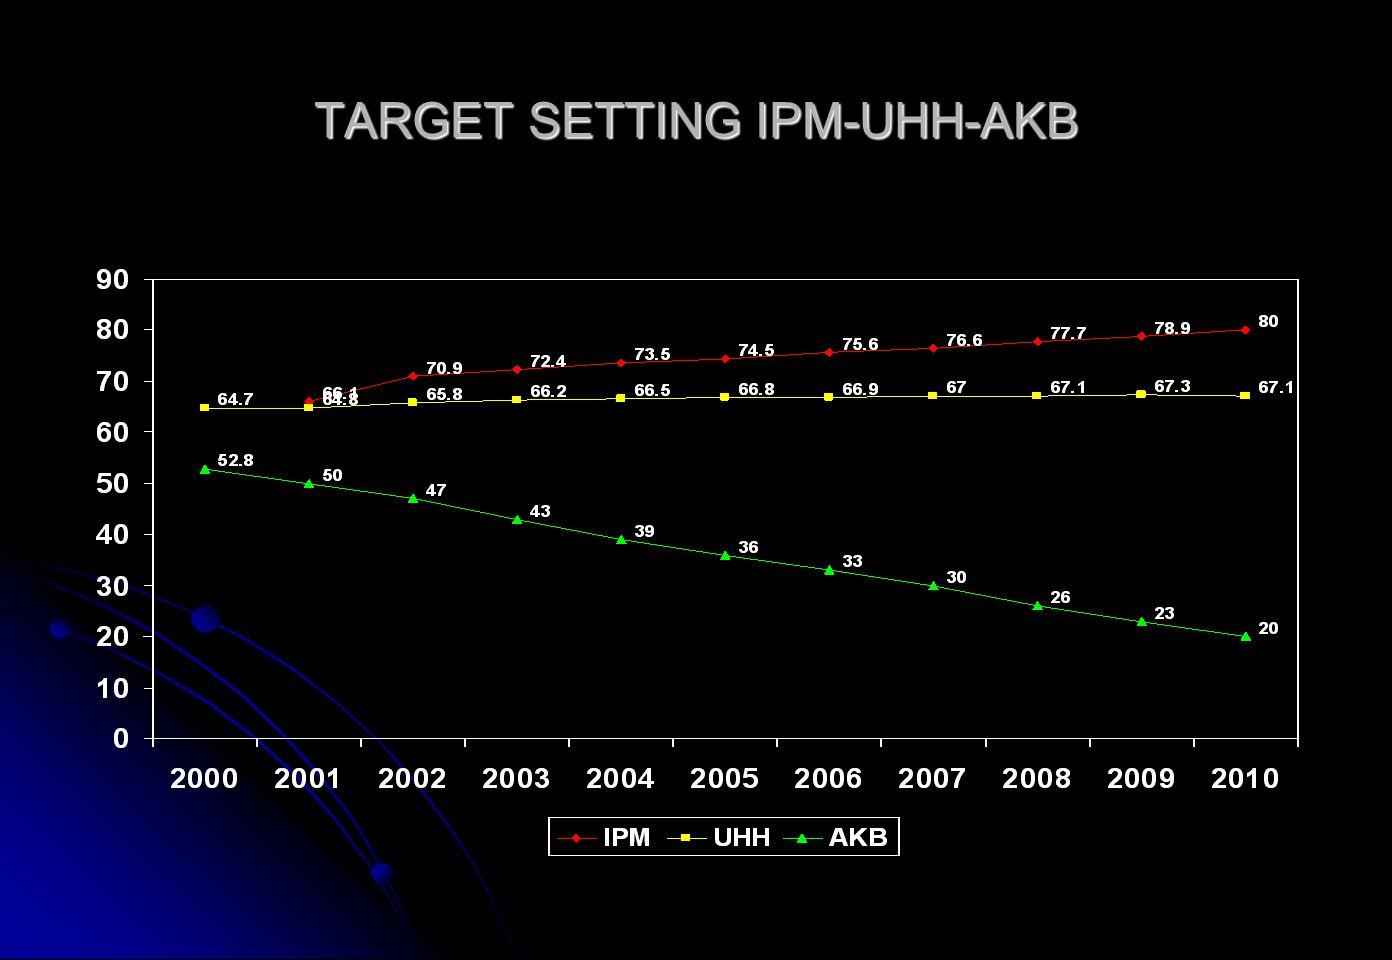 TARGET SETTING IPM-UHH-AKB